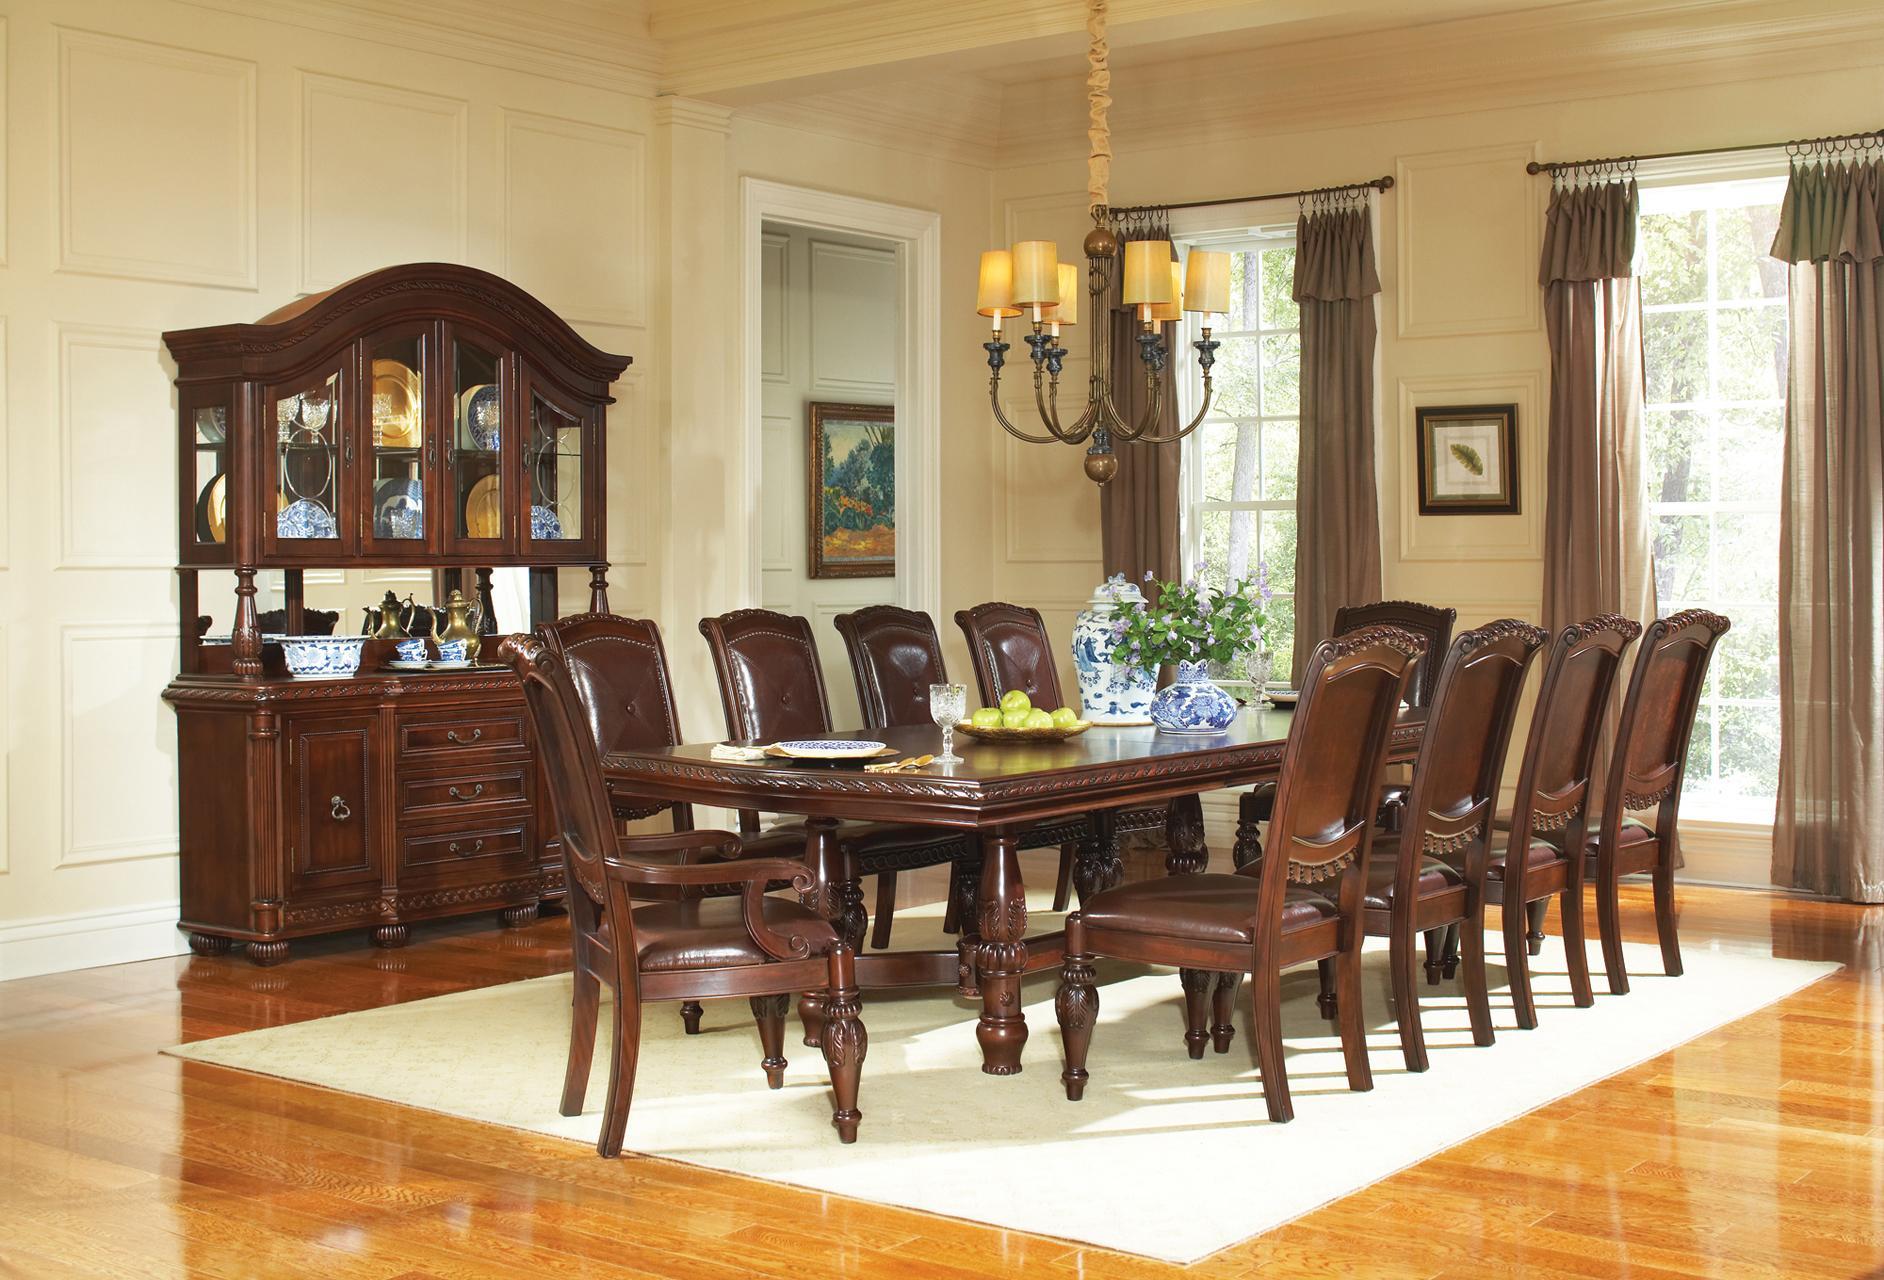 Antoinette Formal Dining Room Group by Steve Silver at Standard Furniture